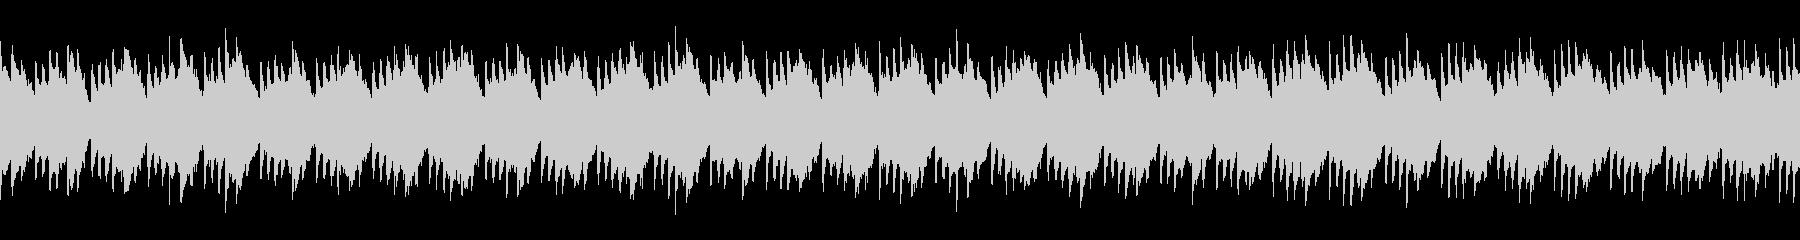 (loop)ピアノが印象的なループBGMの未再生の波形